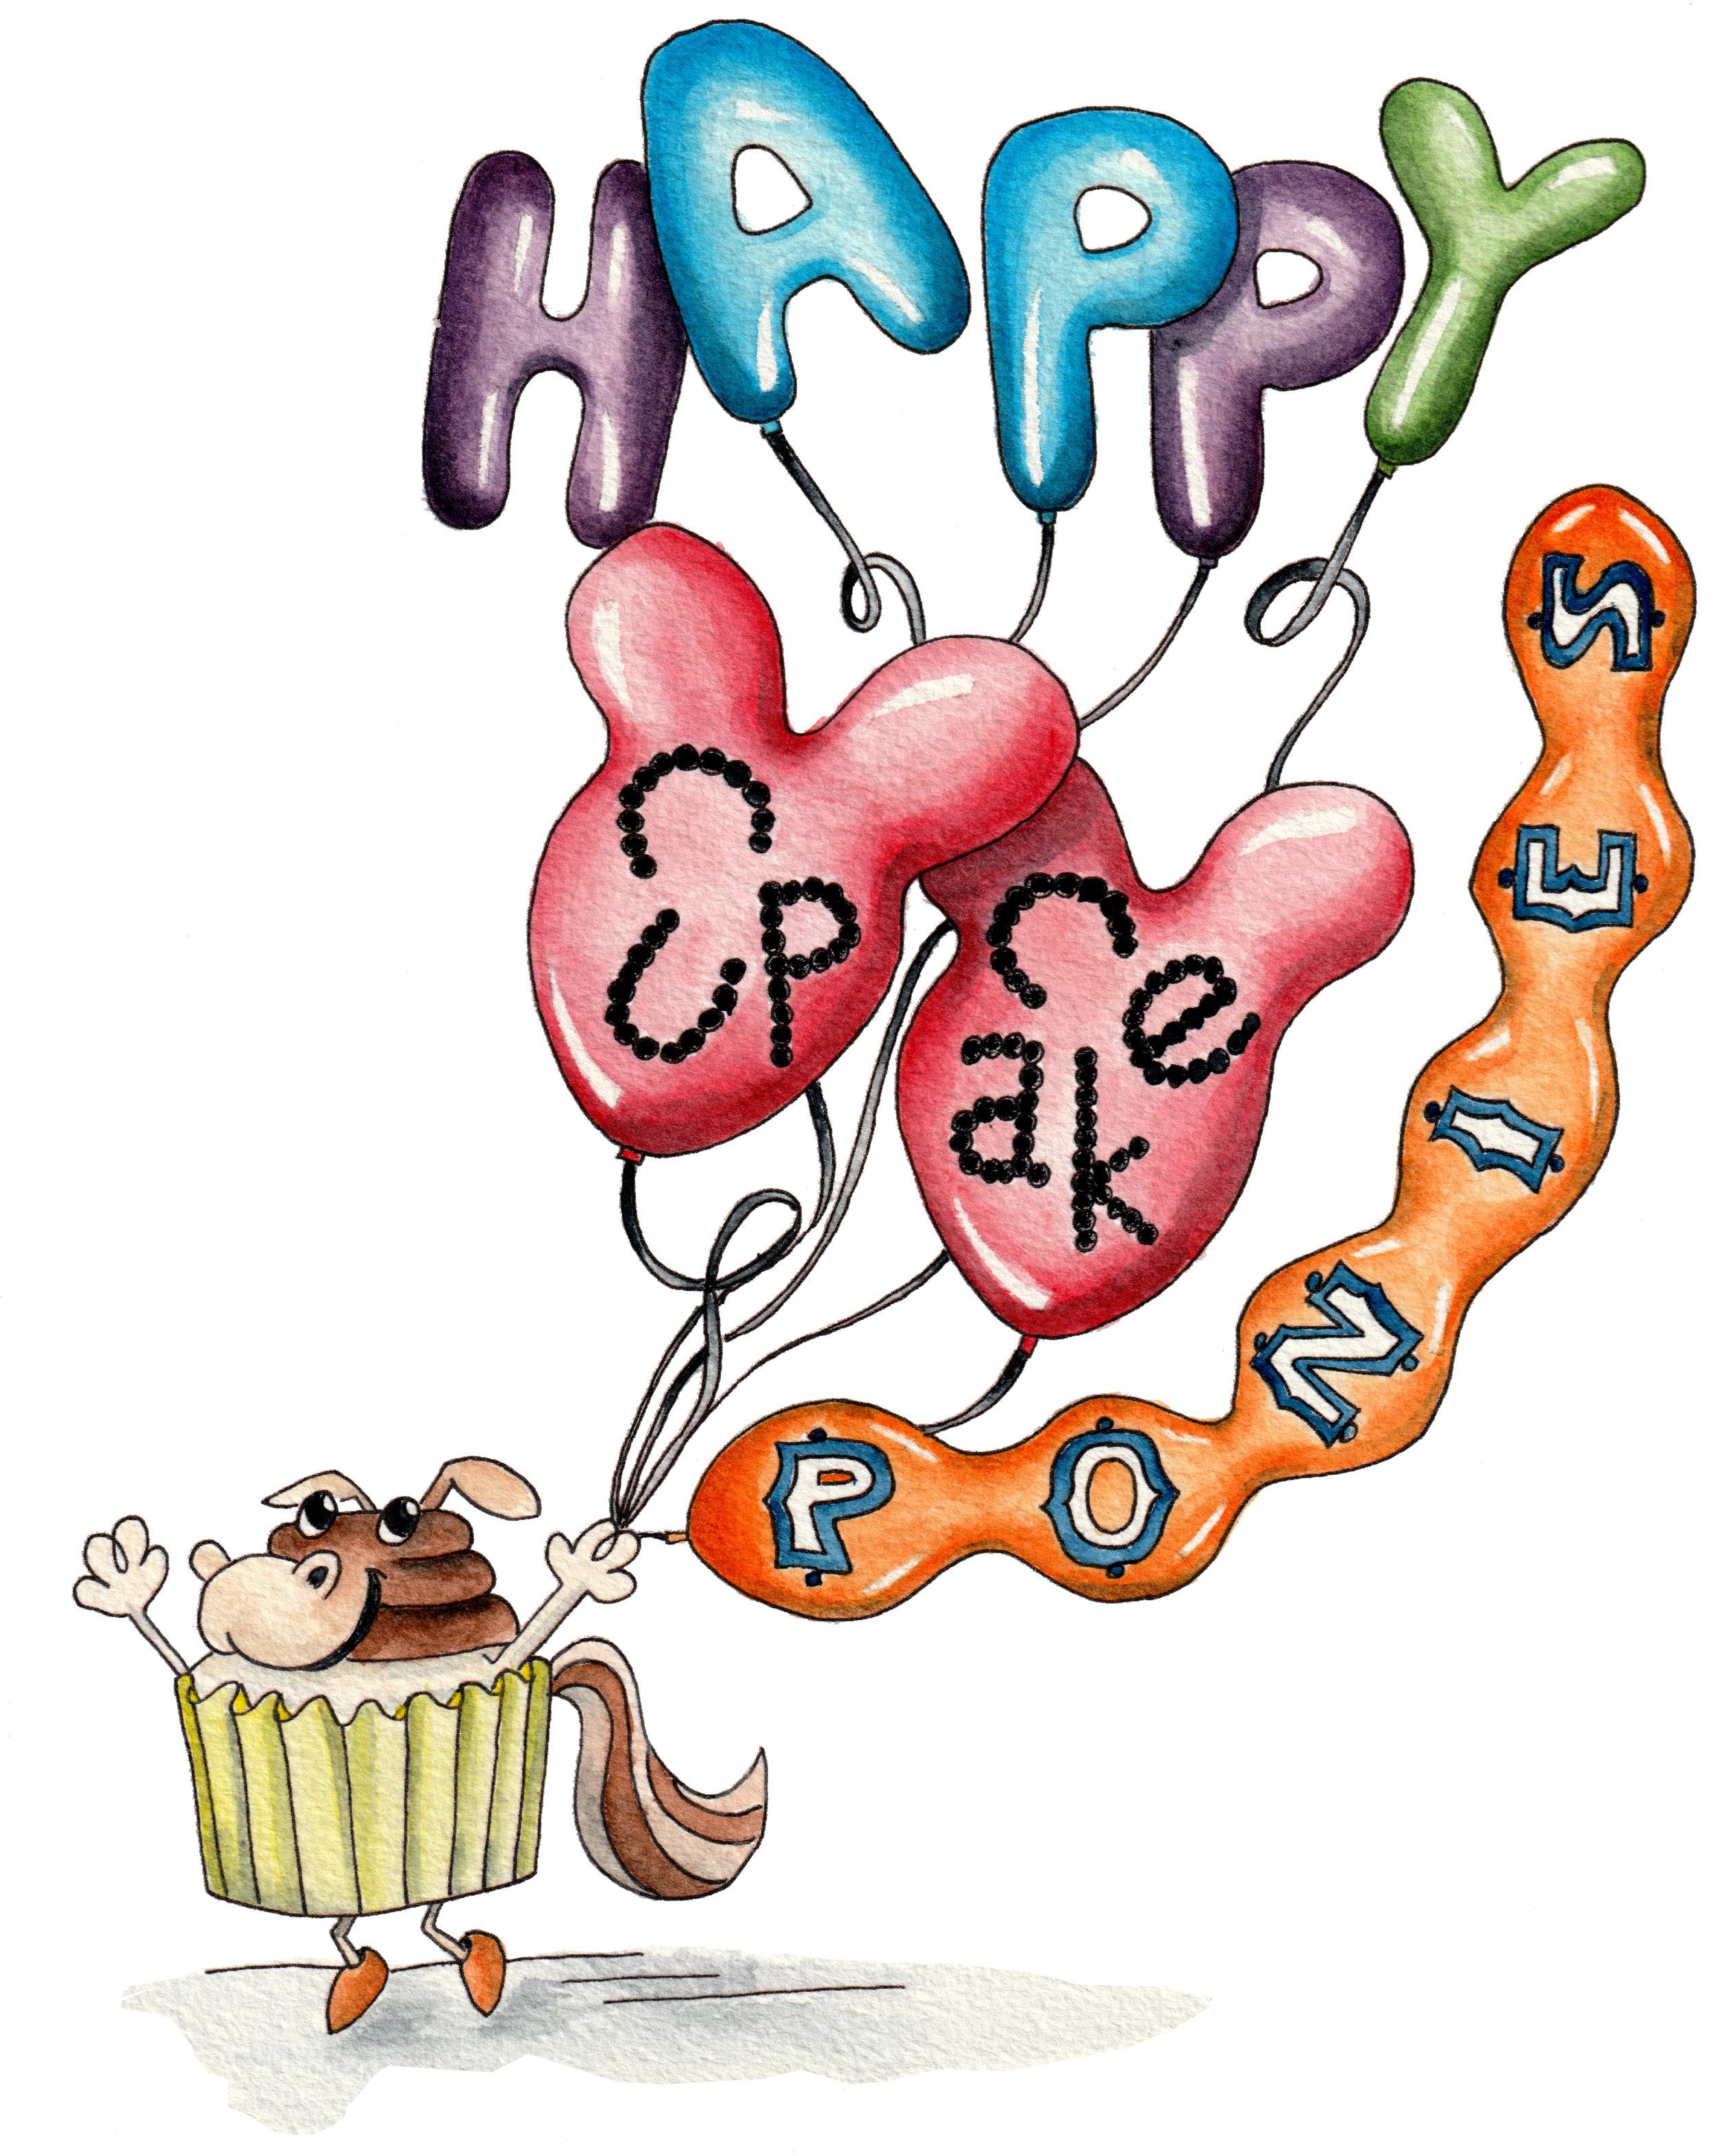 HAPPY CUPCAKE PONIES